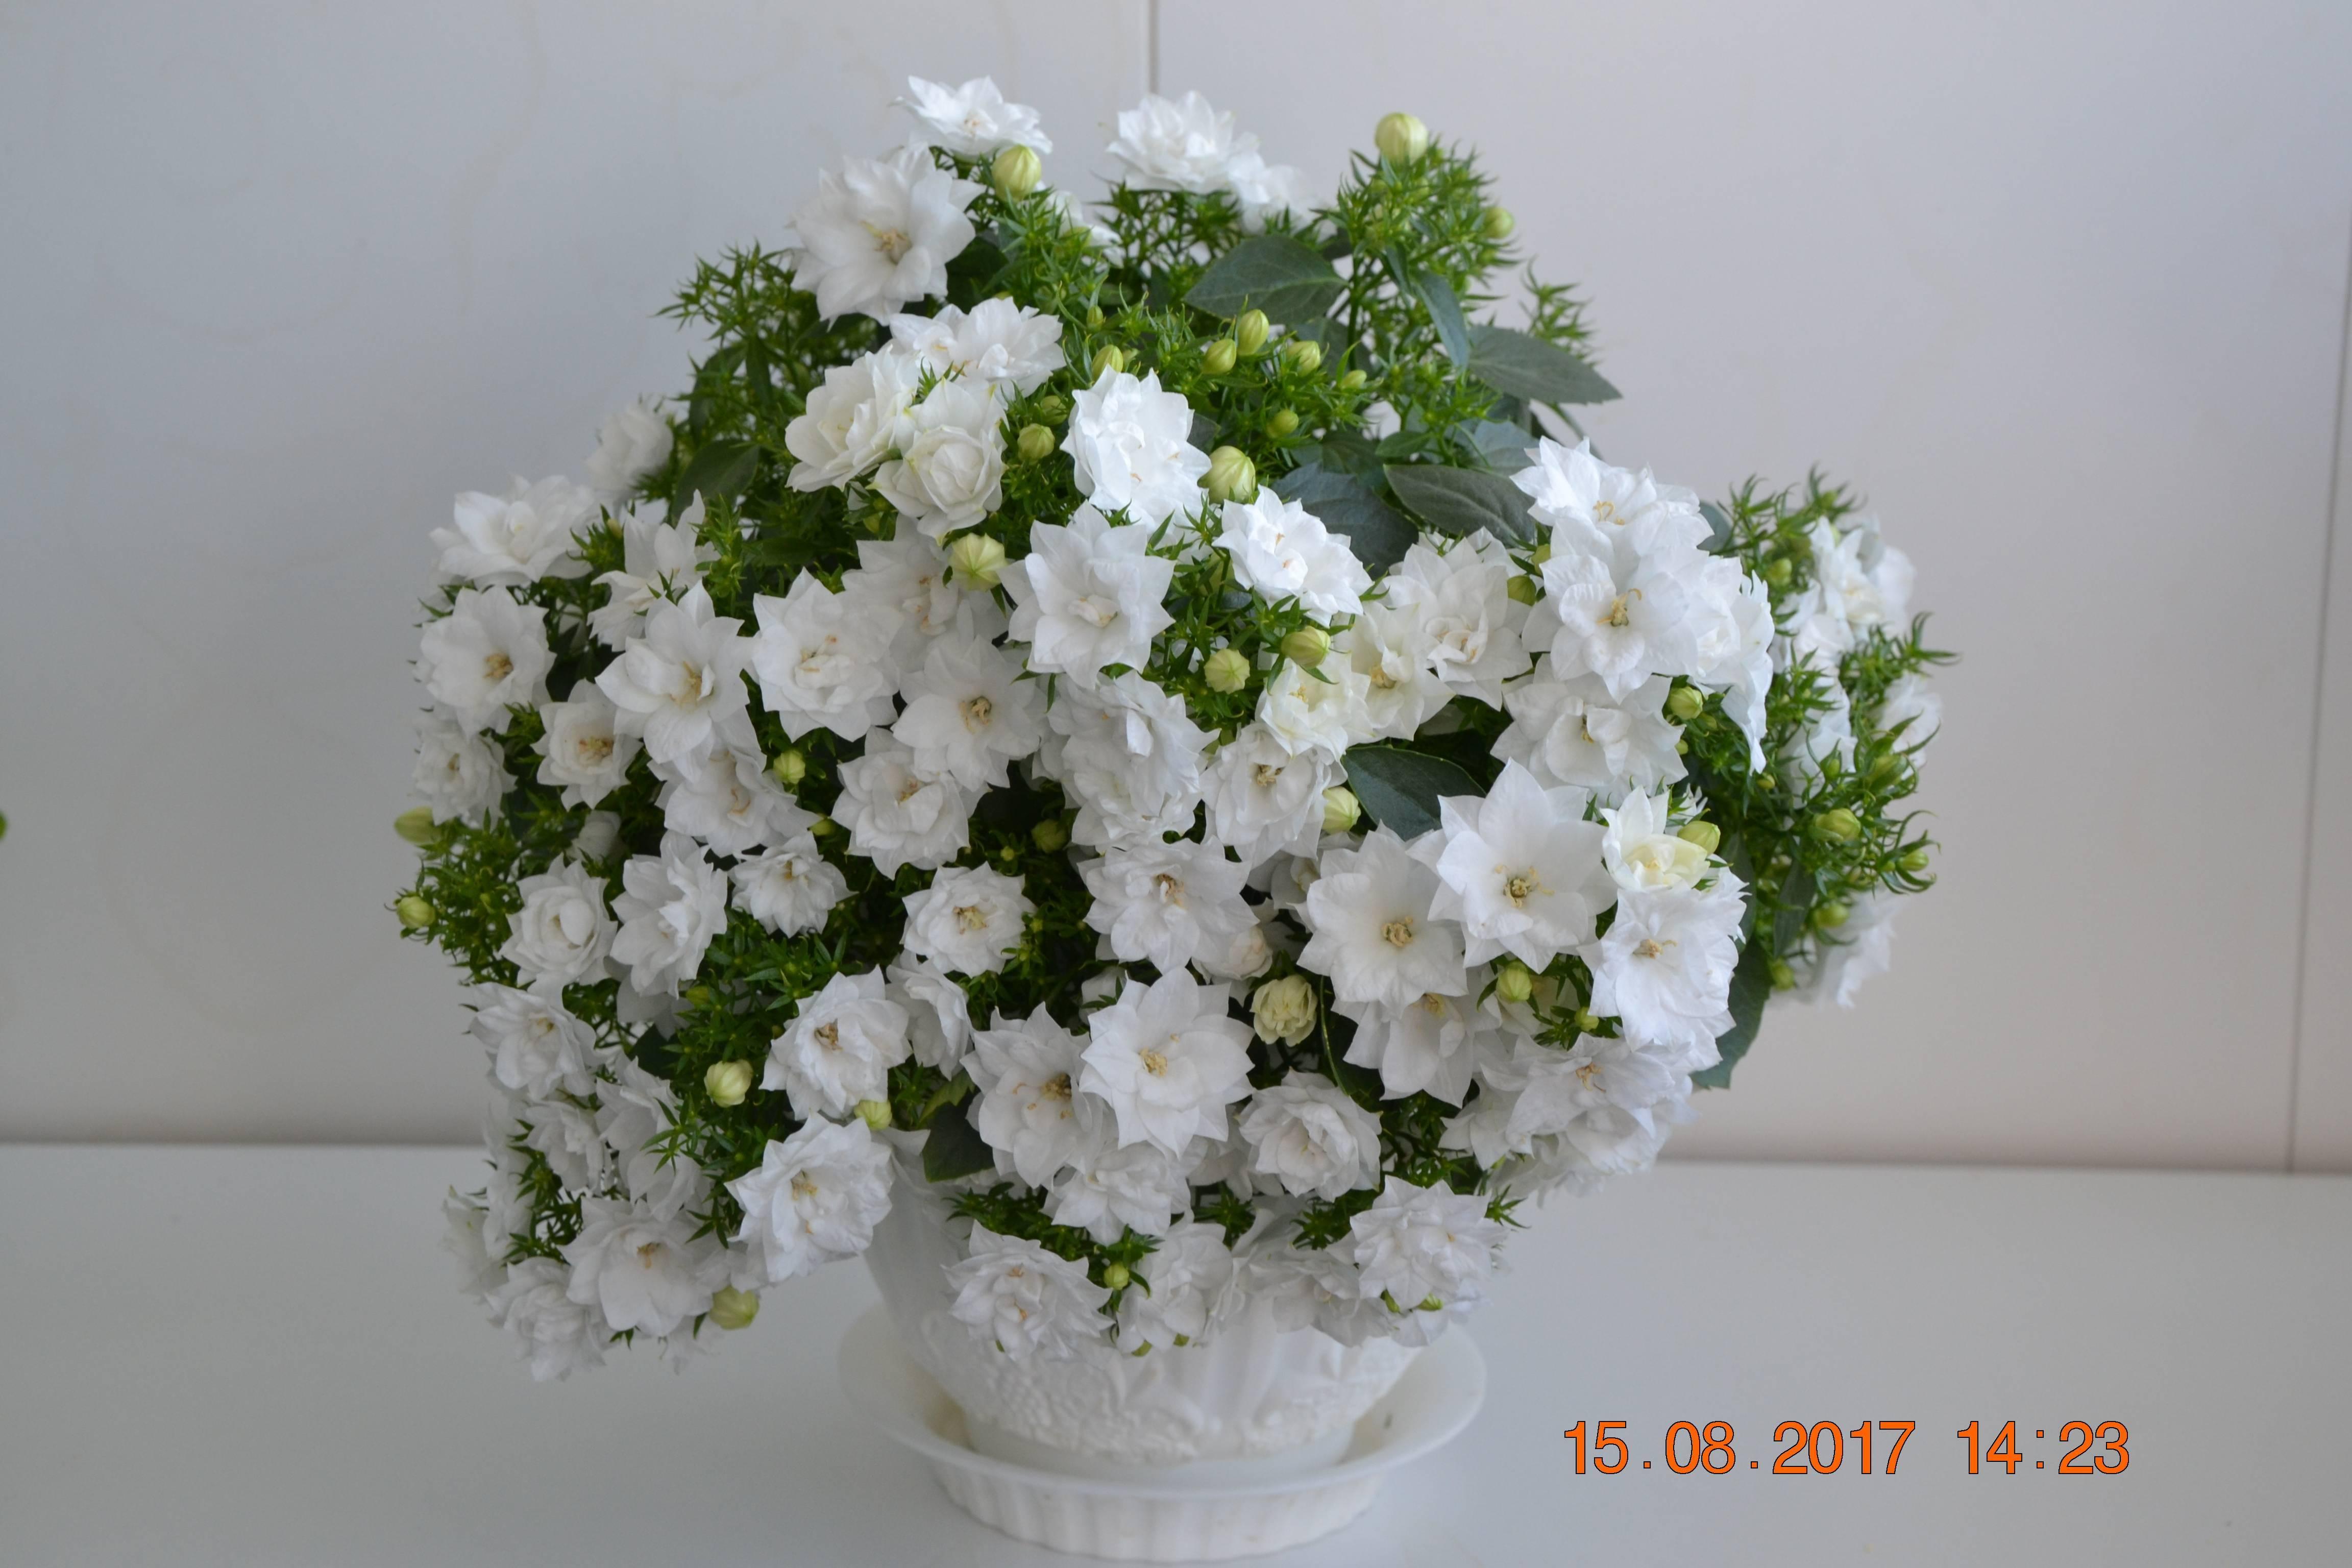 Комнатный цветок кампанула: уход и размножение